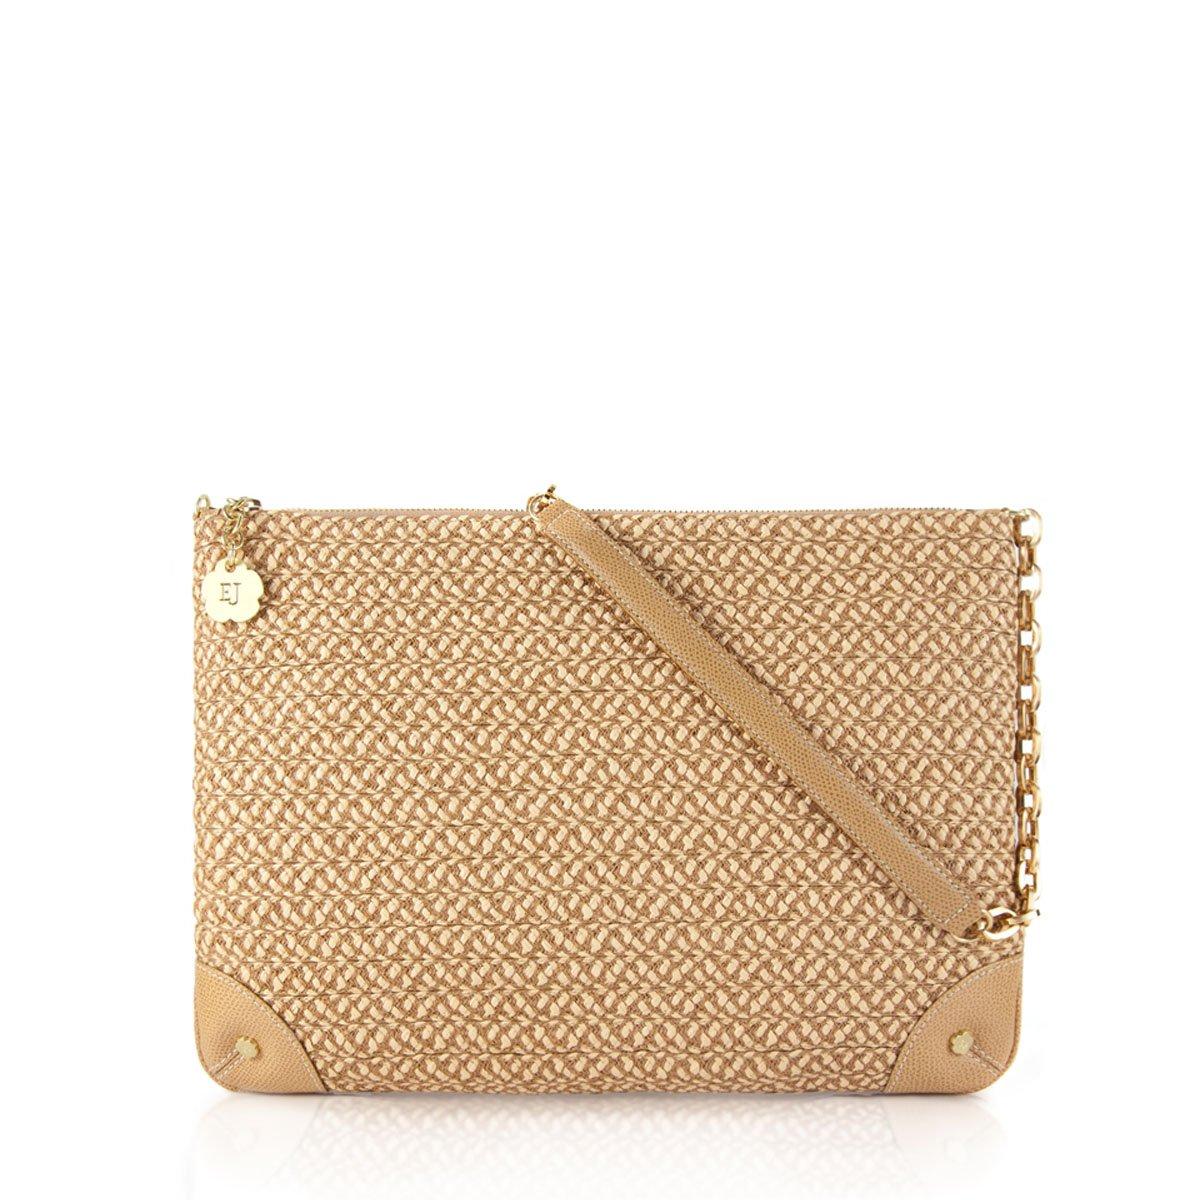 Eric Javits Luxury Fashion Designer Women's Handbag - Squishee Didi - Peanut